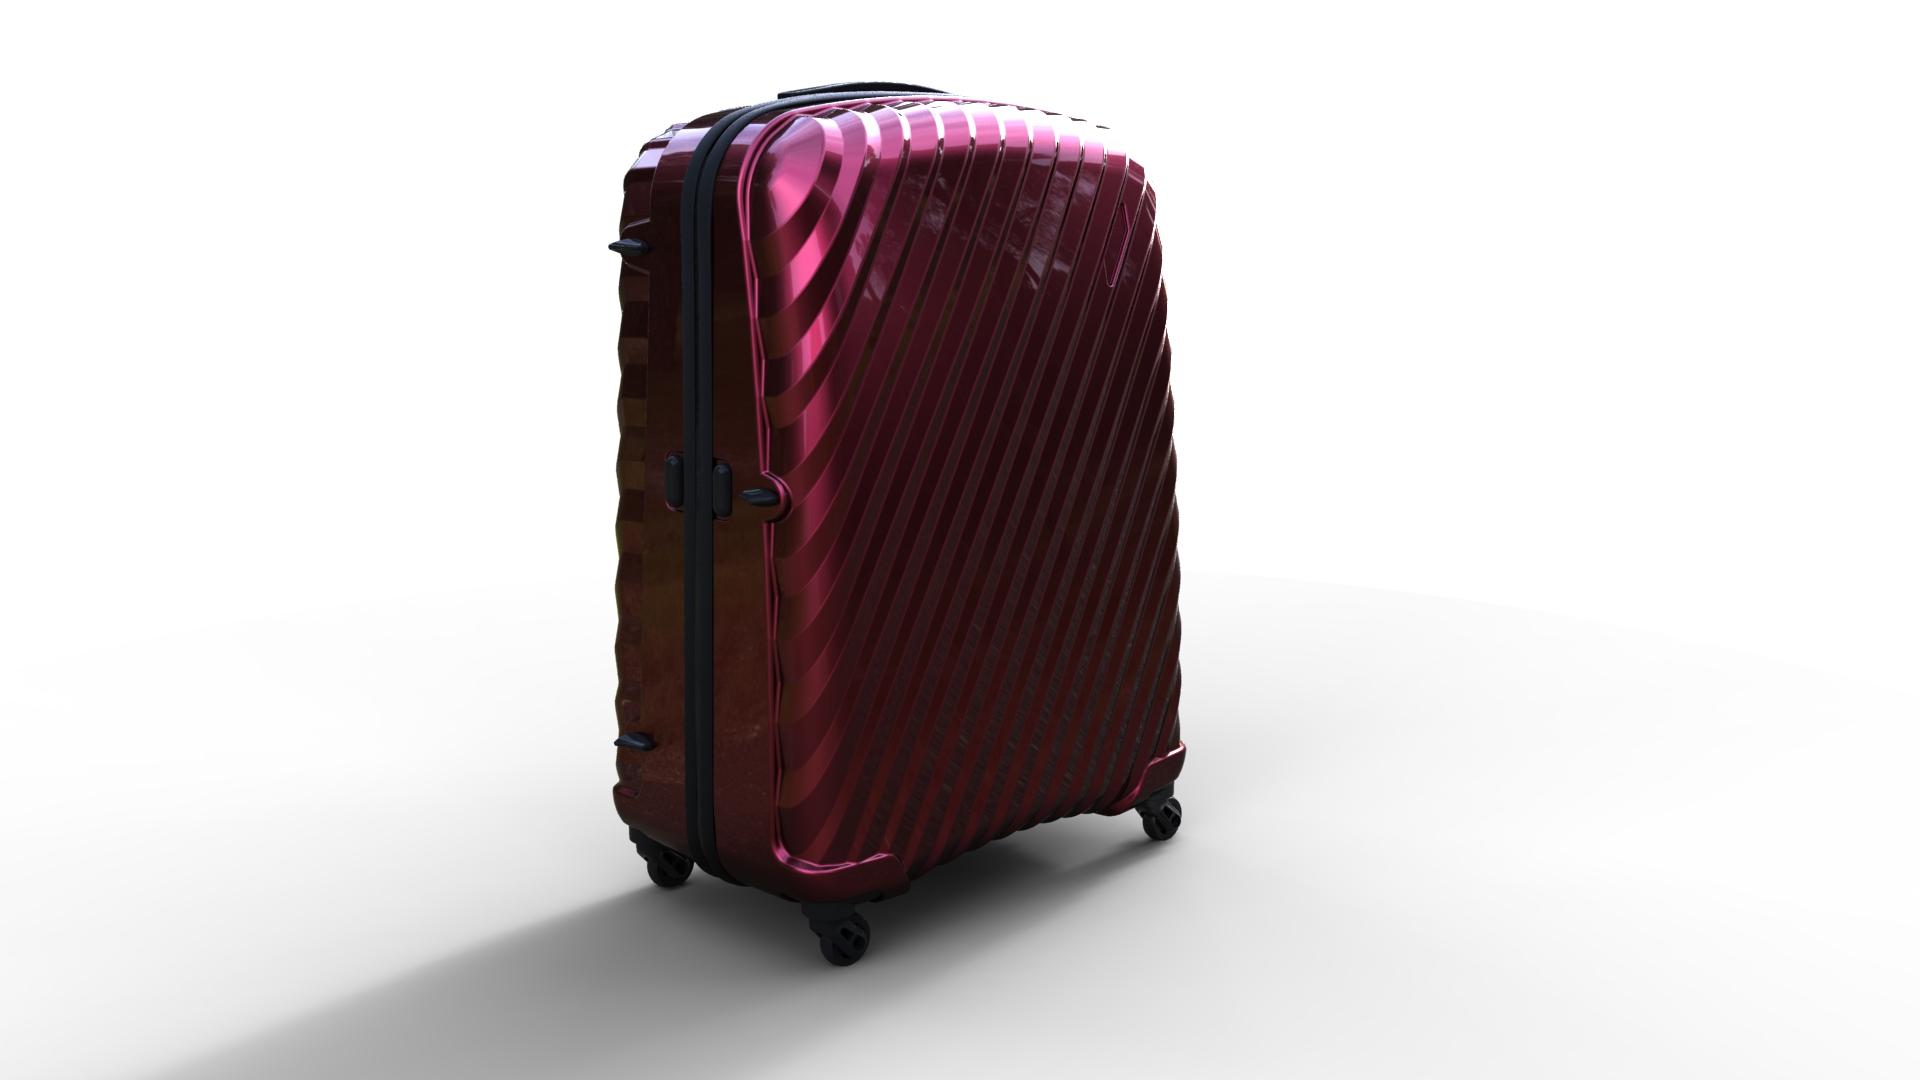 trolley suitcase bag 03 3d model max fbx ma mb obj 285998